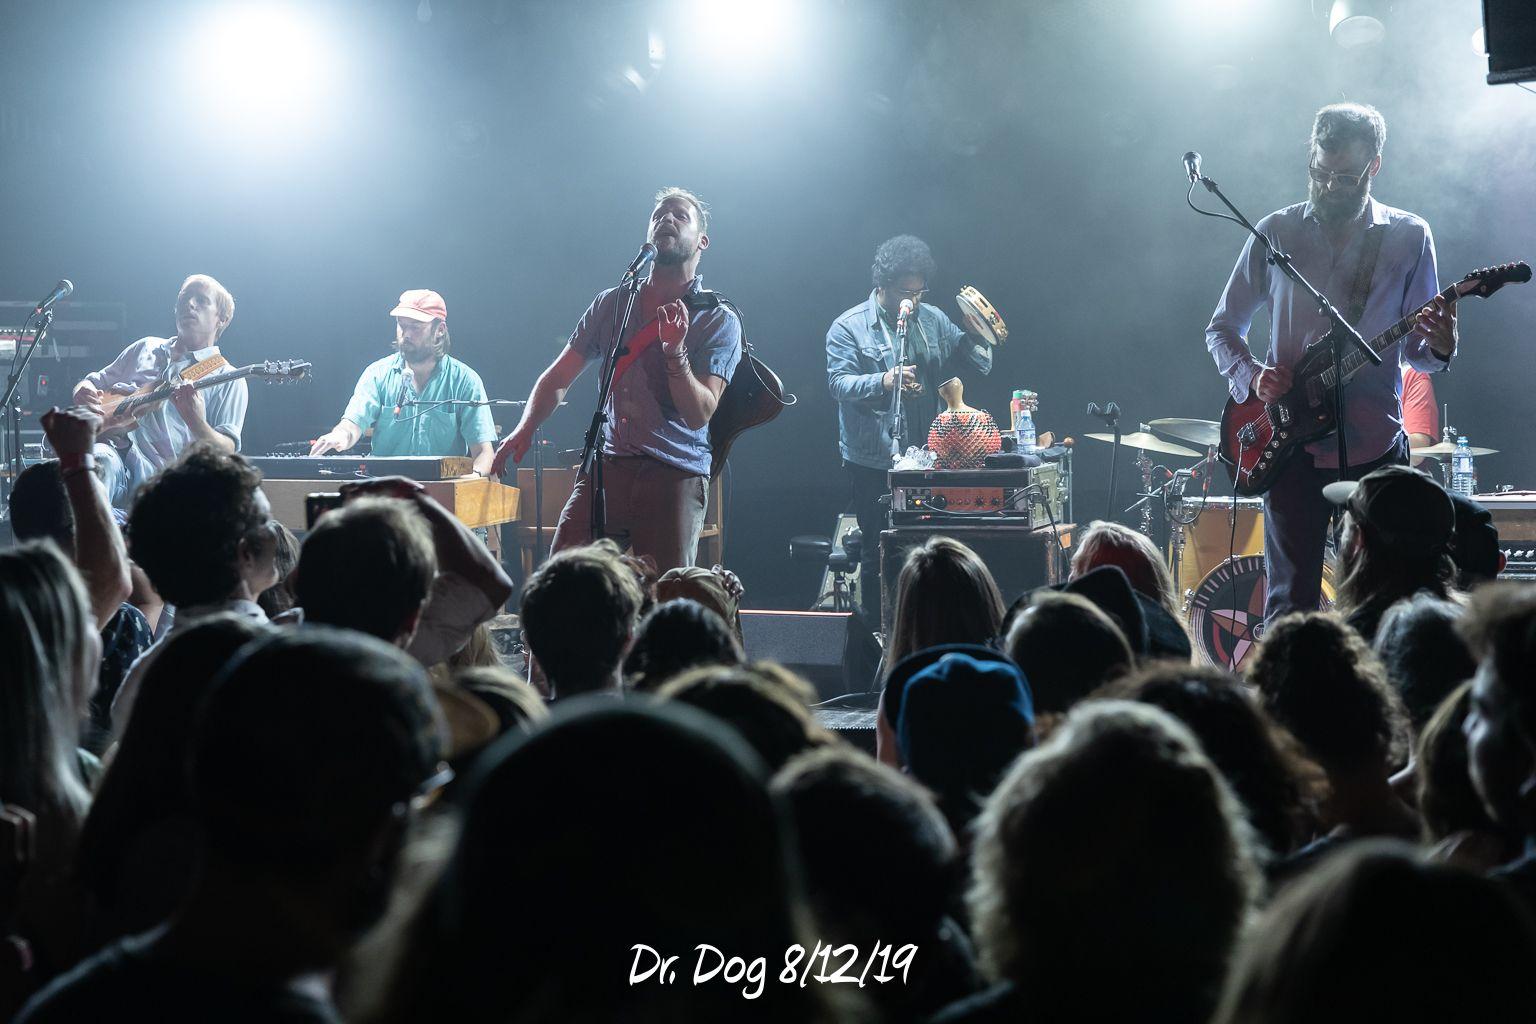 Dr. Dog 8/12/19